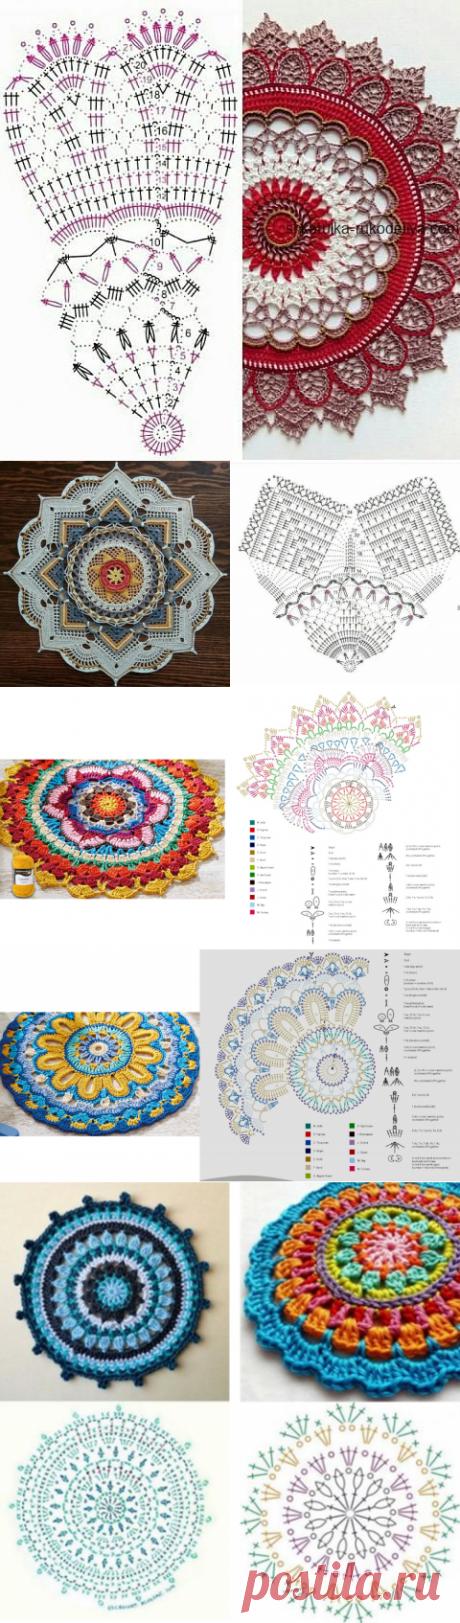 Мандала - не бабушкин, но все же бабушкин квадрат - супер схемы с образцами - часть 2 | МНЕ ИНТЕРЕСНО | Яндекс Дзен